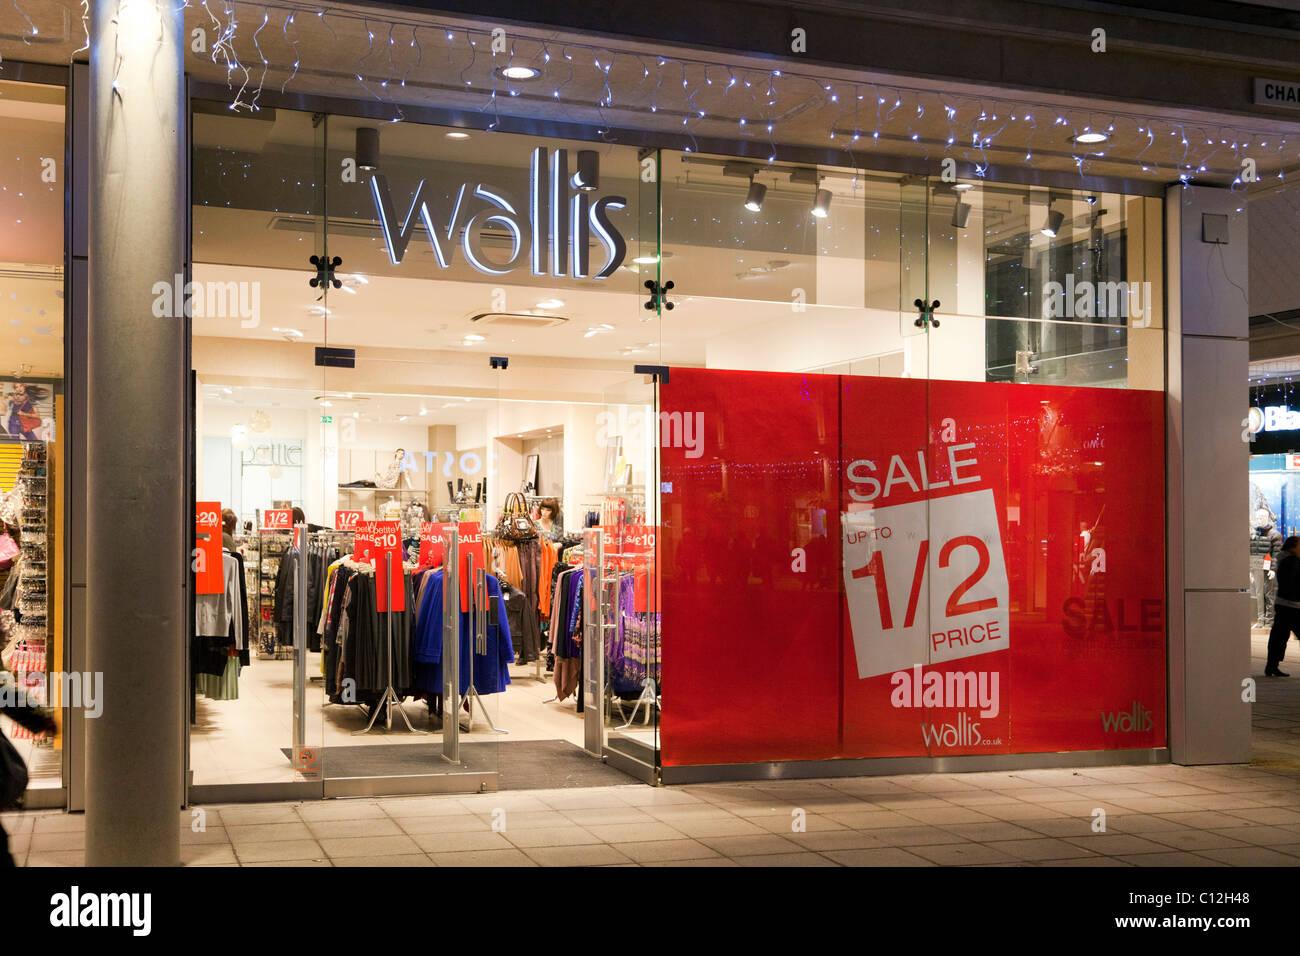 sales at  Wallis clothing store in UK - Stock Image